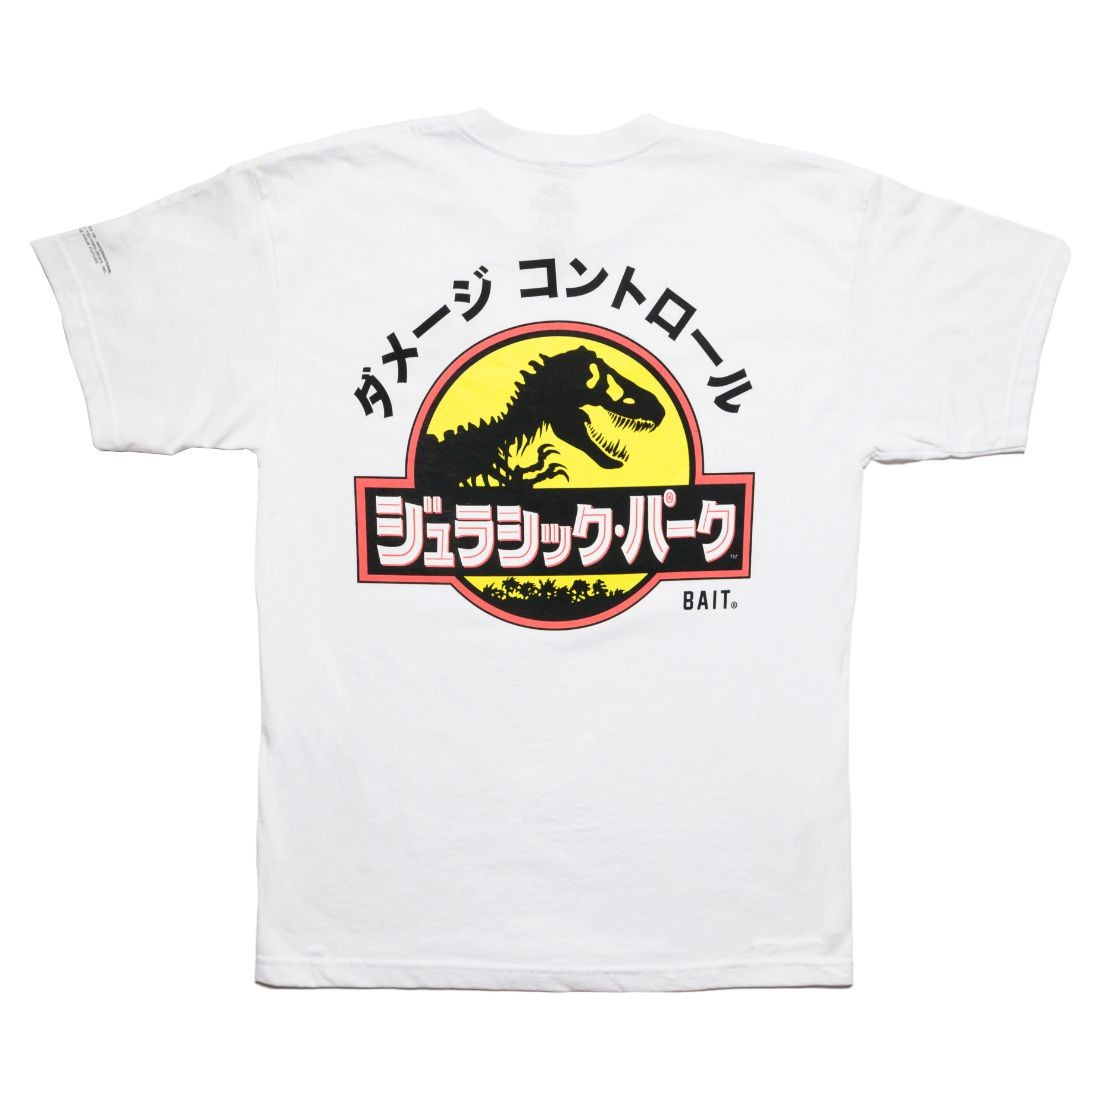 BAIT x Jurassic Park Men Damage Control Tee (white)